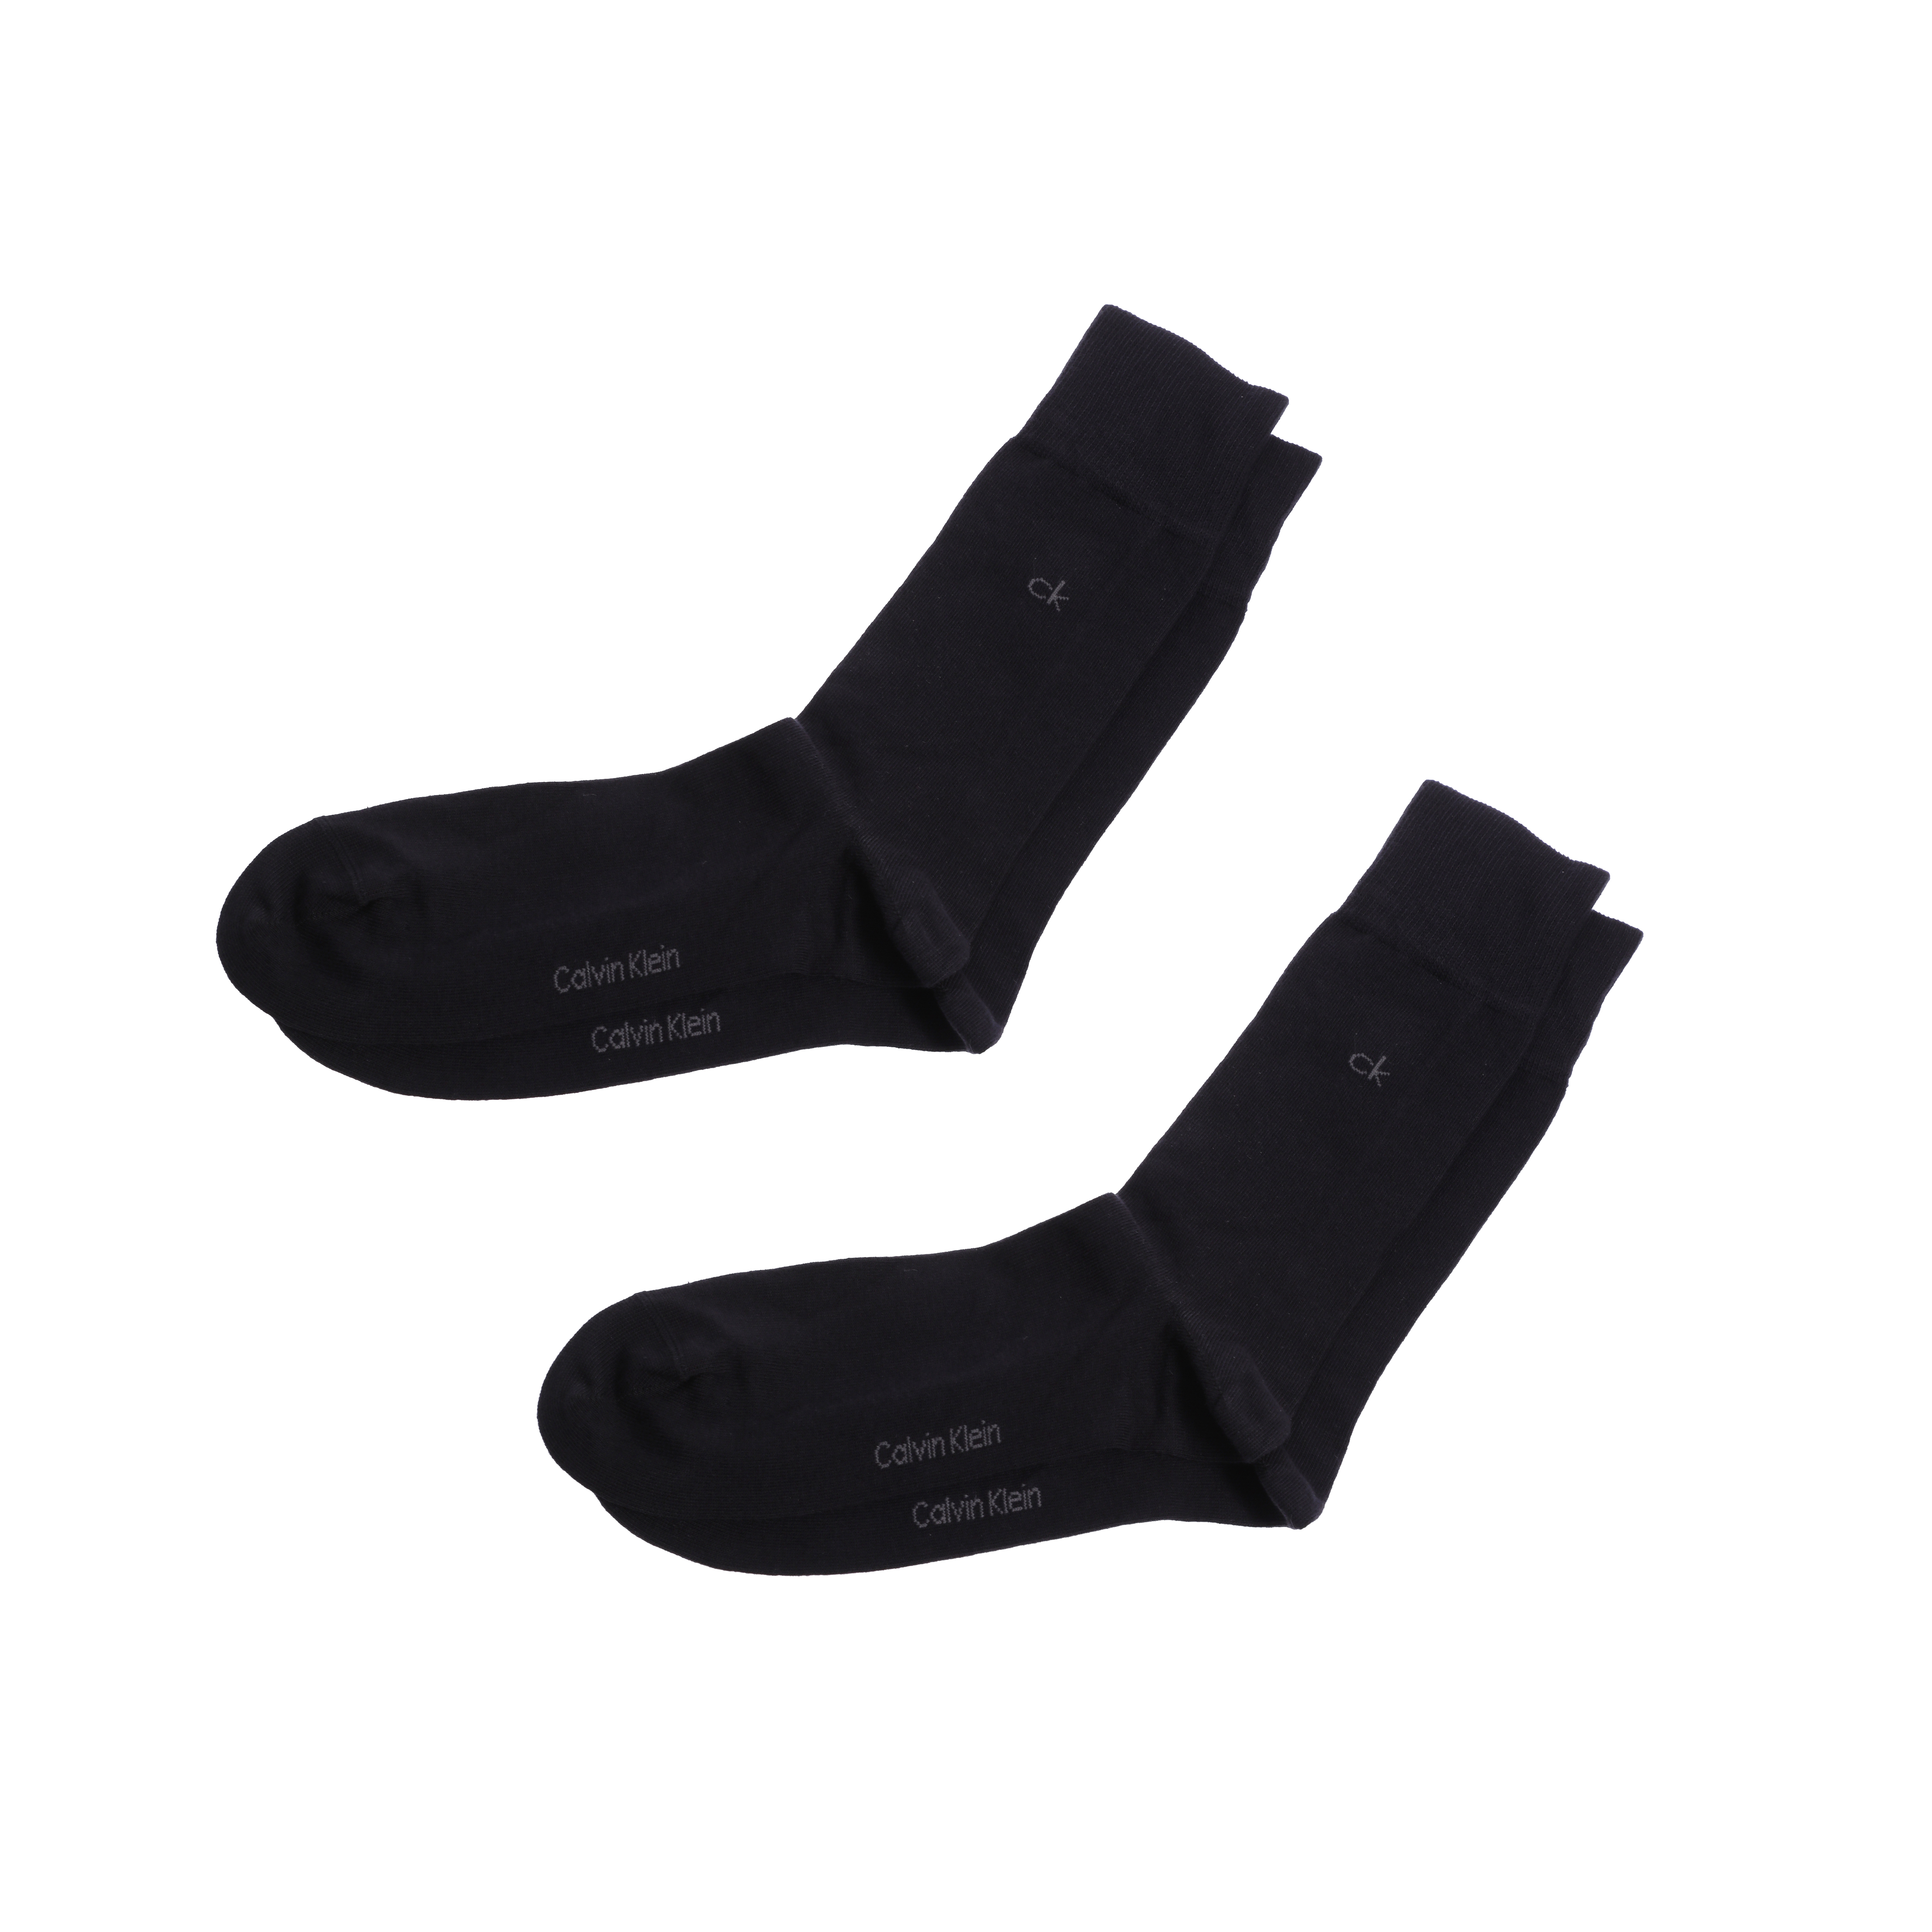 CK UNDERWEAR - Ανδρικό σετ κάλτσες Calvin Klein μαύρες ανδρικά αξεσουάρ κάλτσες